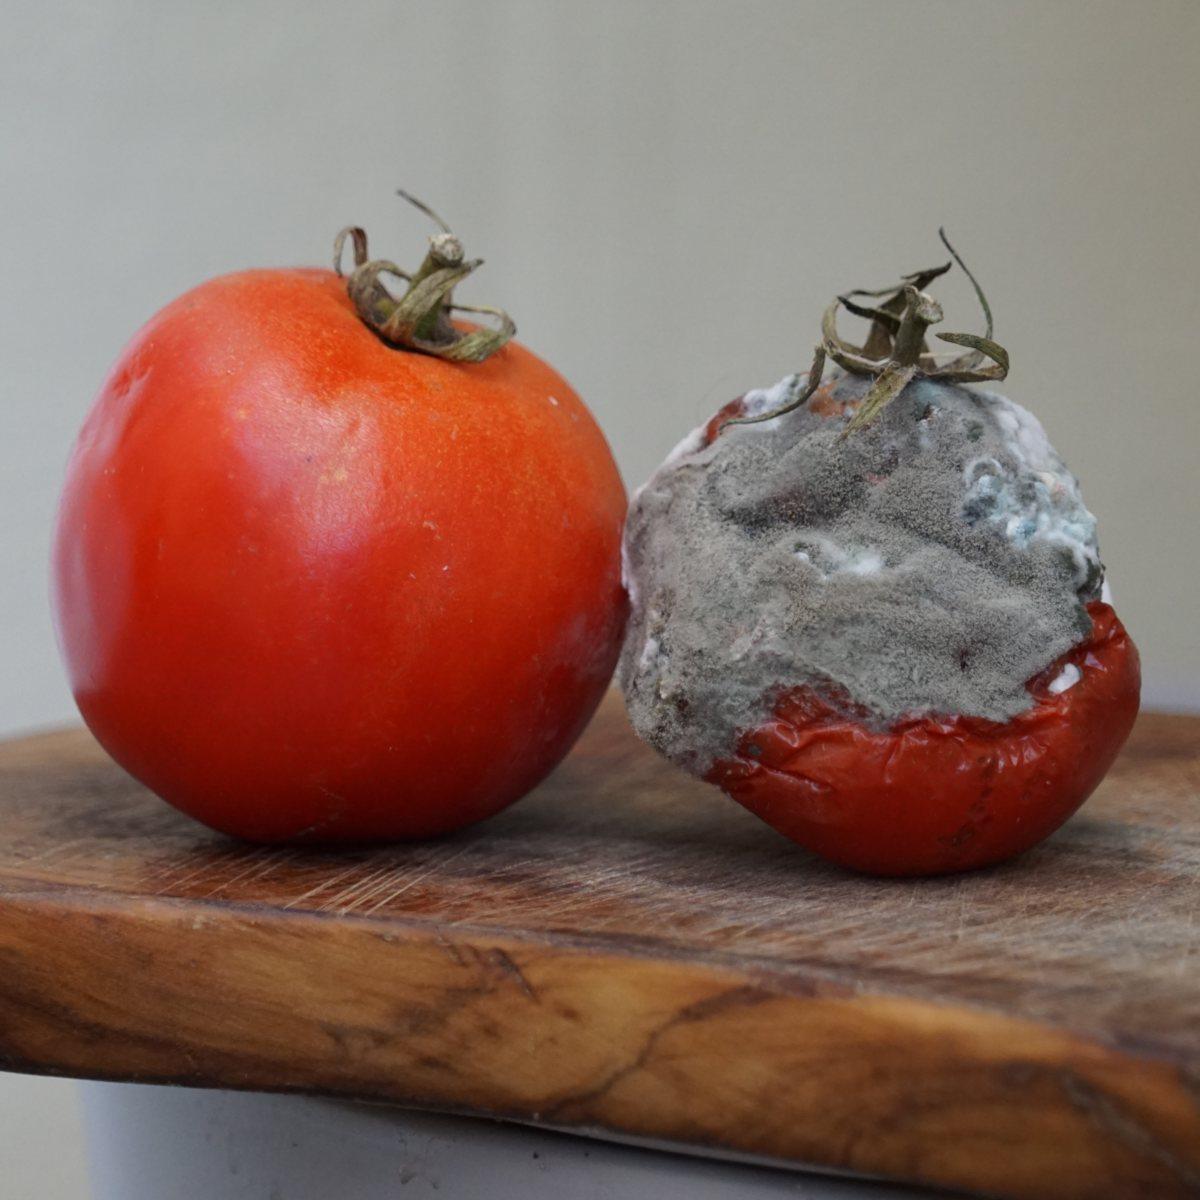 Moldy food, fruits & vegetables – safe to eat?